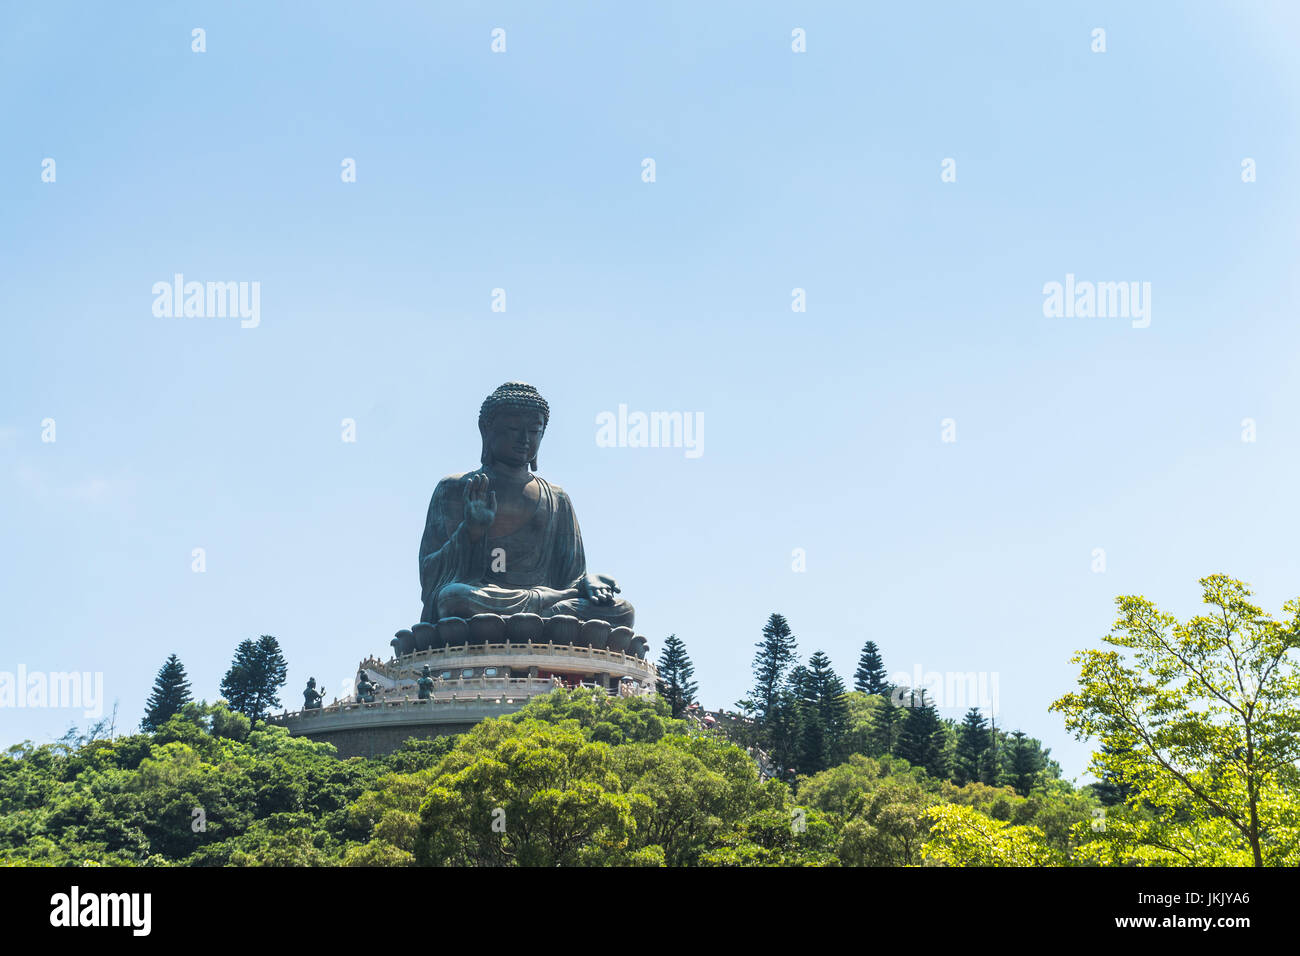 Tian tan buddha of po lin monastery in lantau island hongkong china - Stock Image